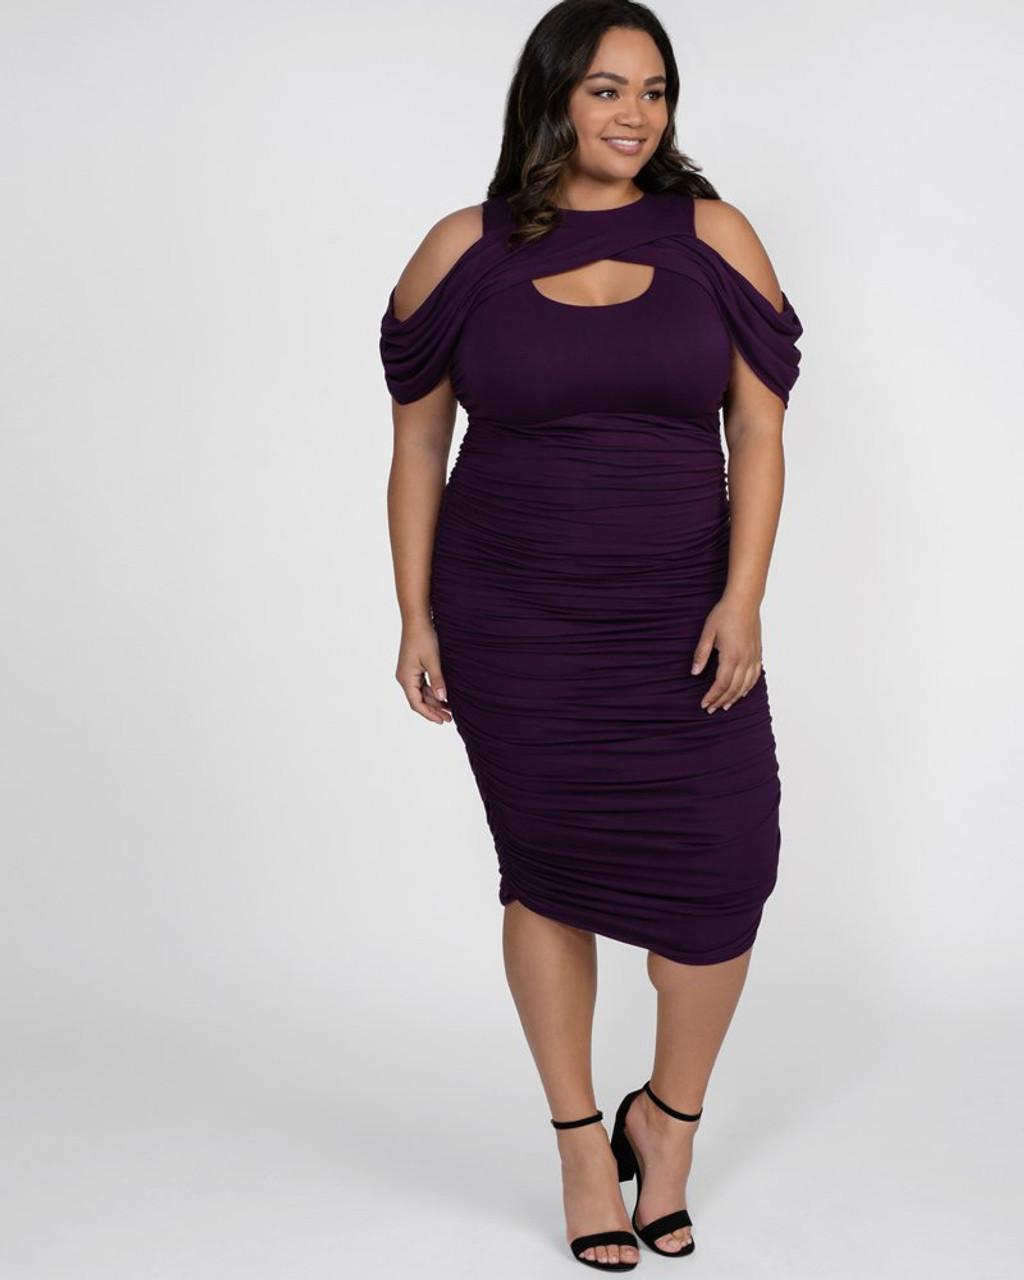 Plus Size Ruched Dresses